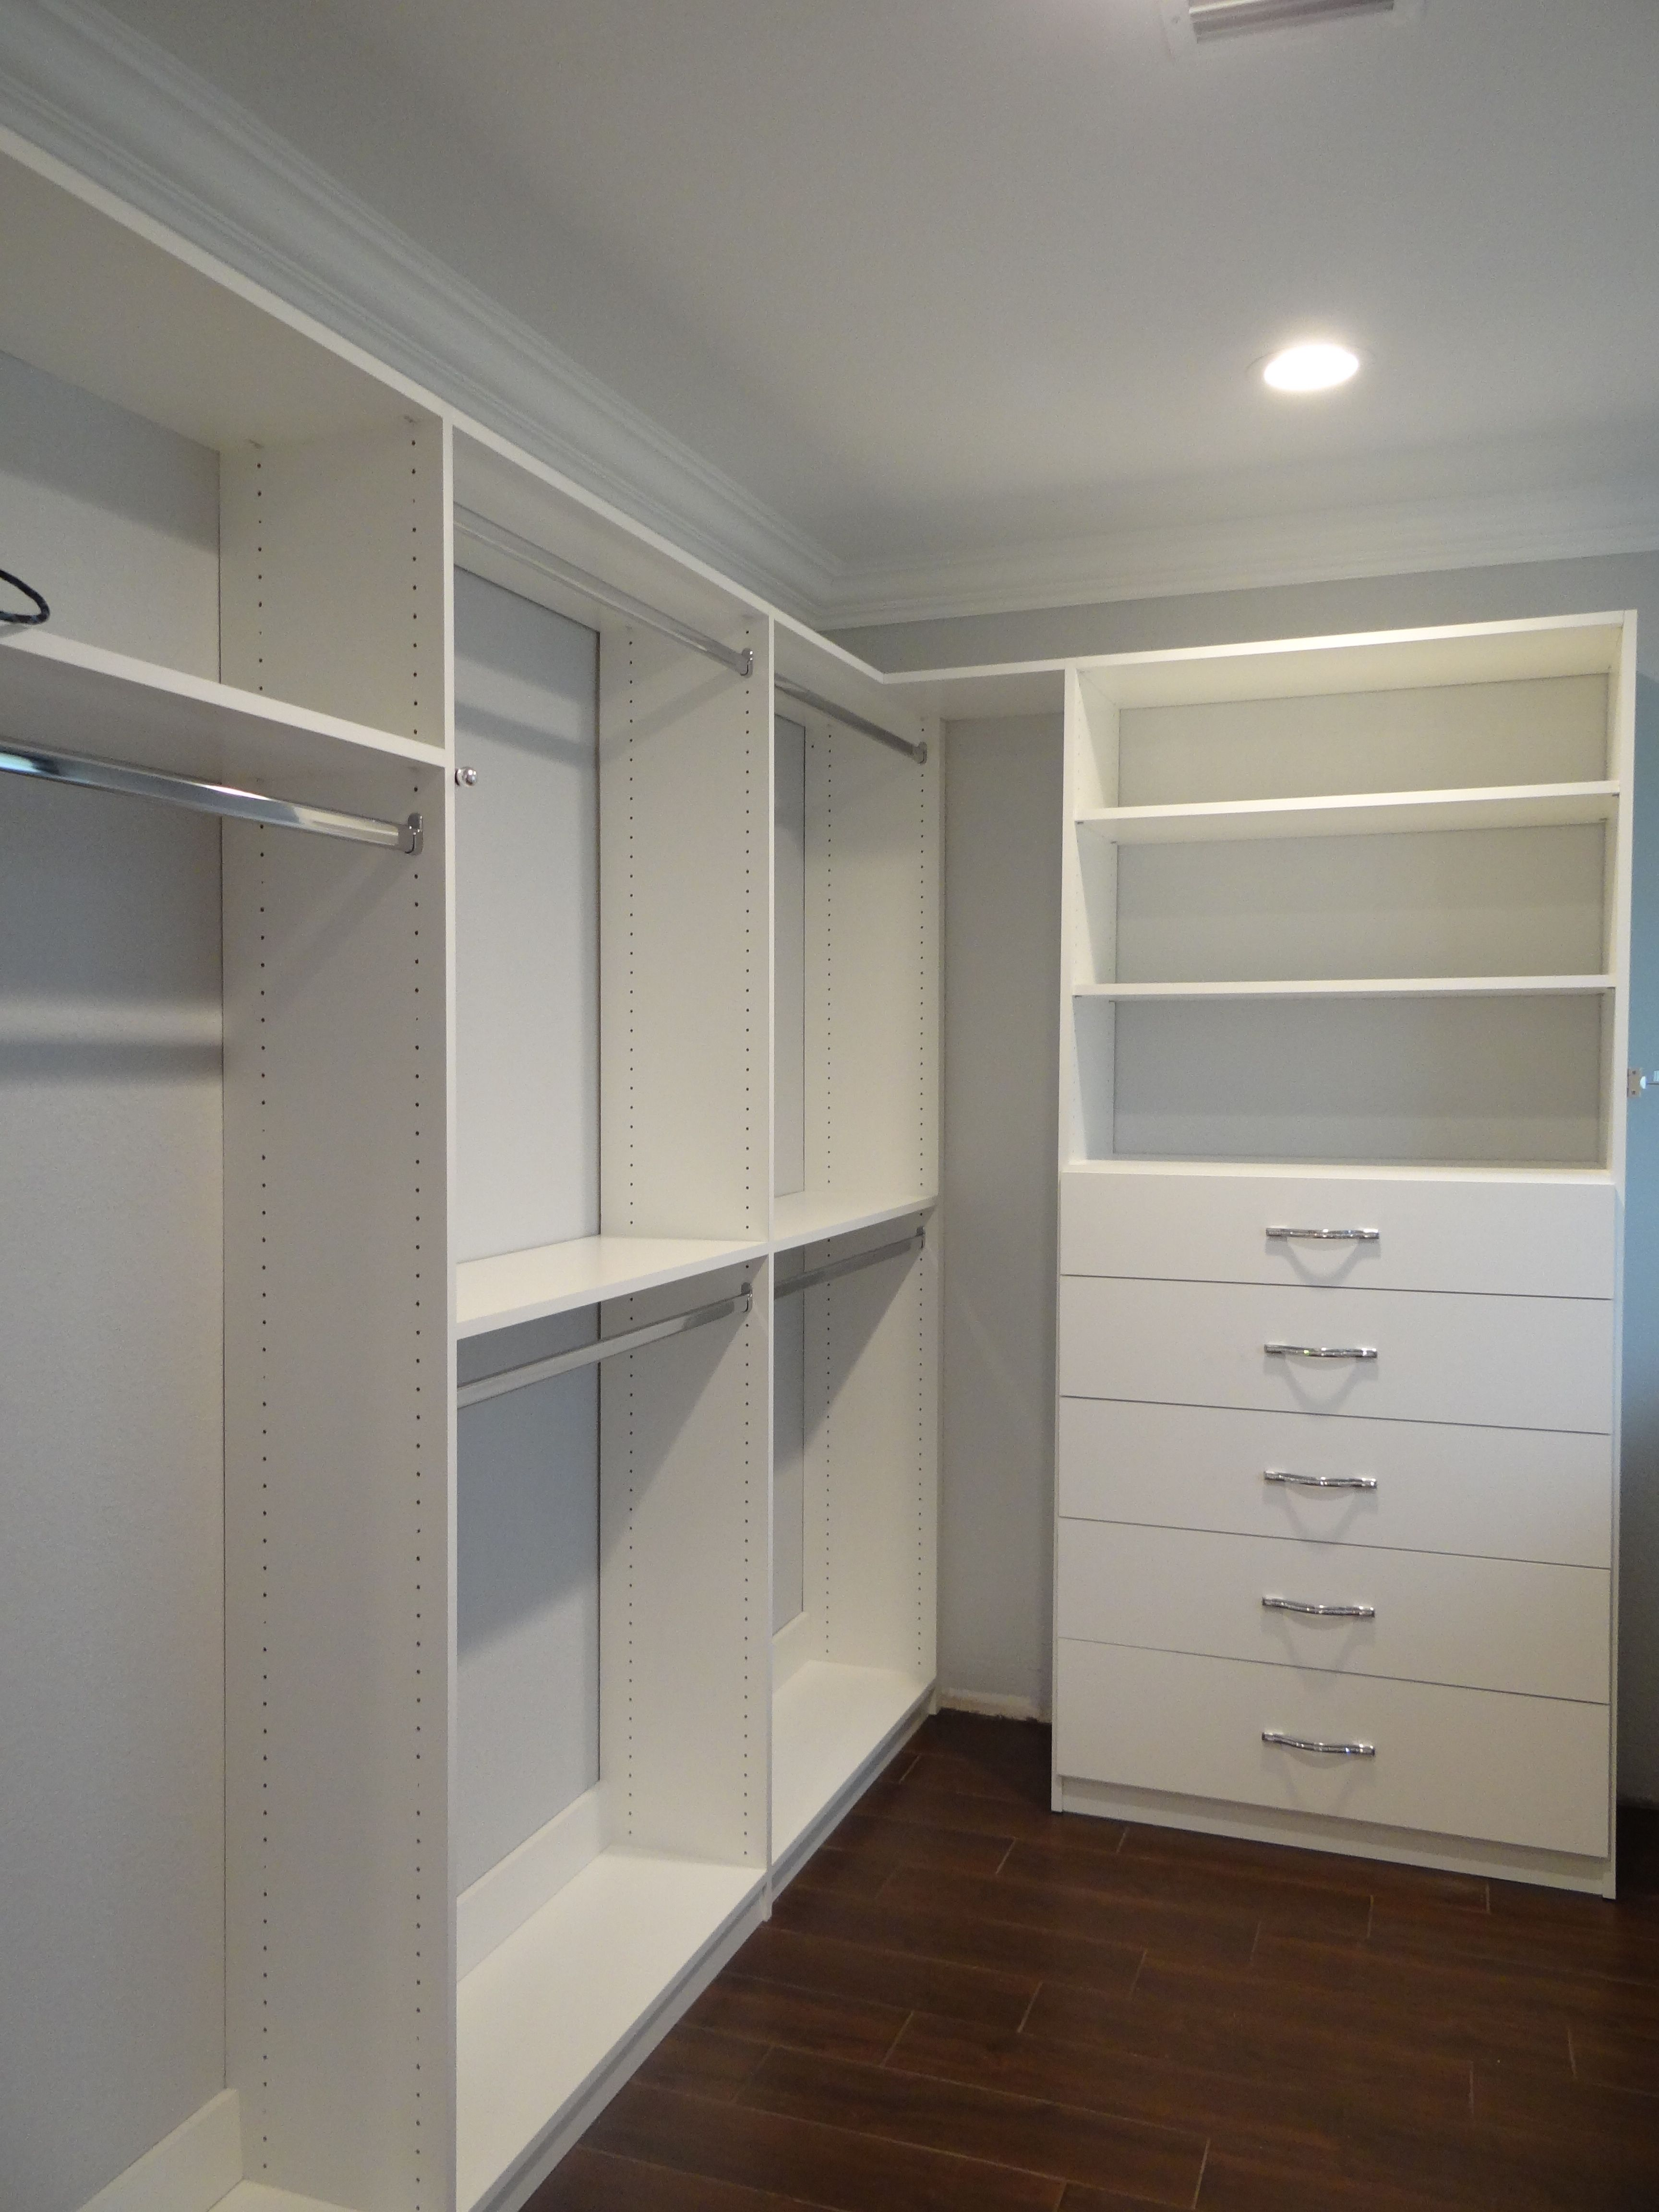 Master bedroom suite with walkin closet. Sherwin Williams